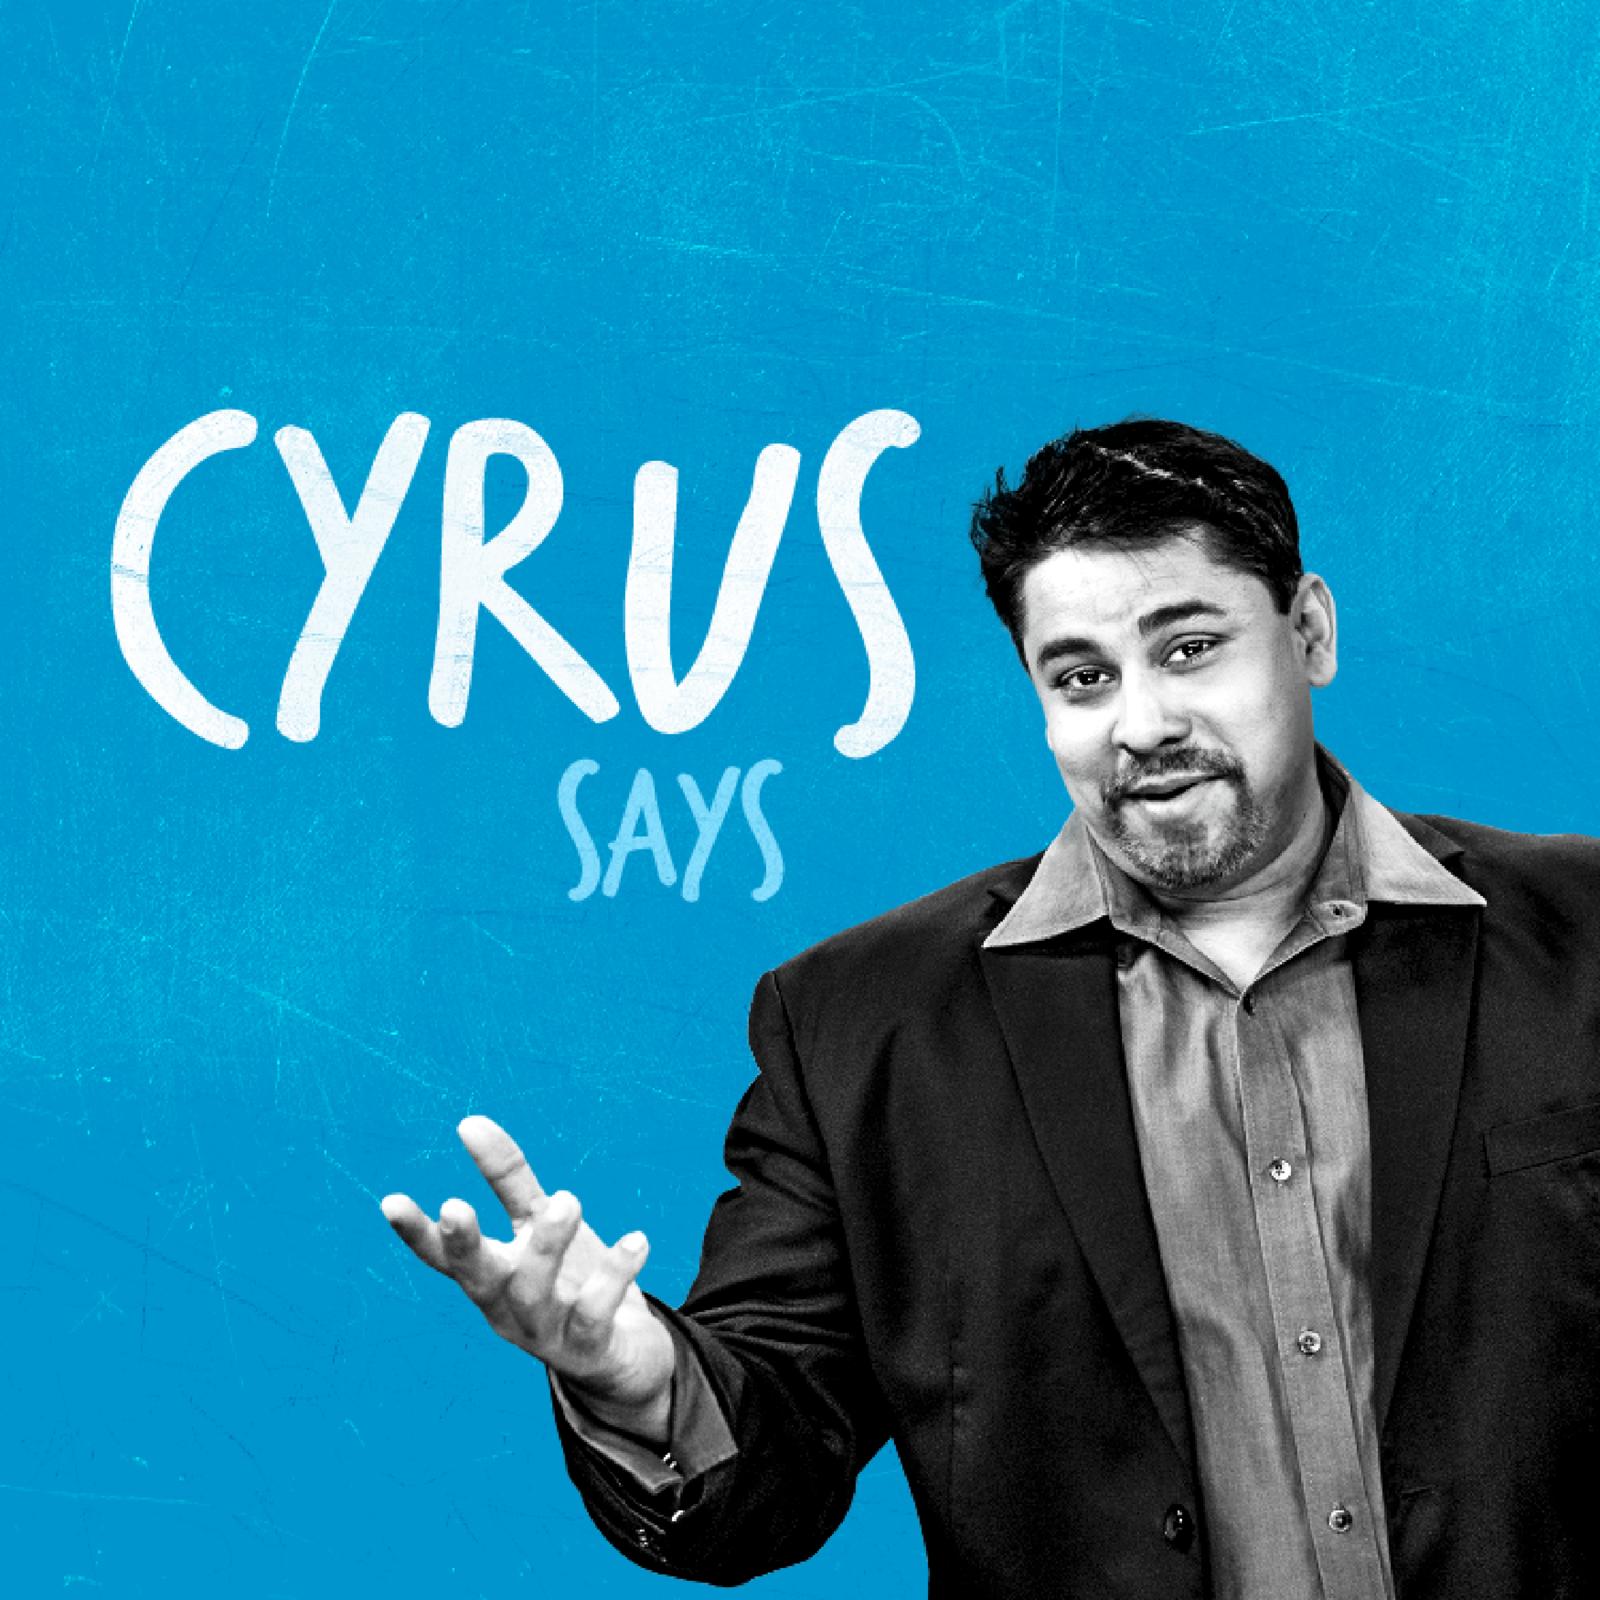 Cyrus Says |